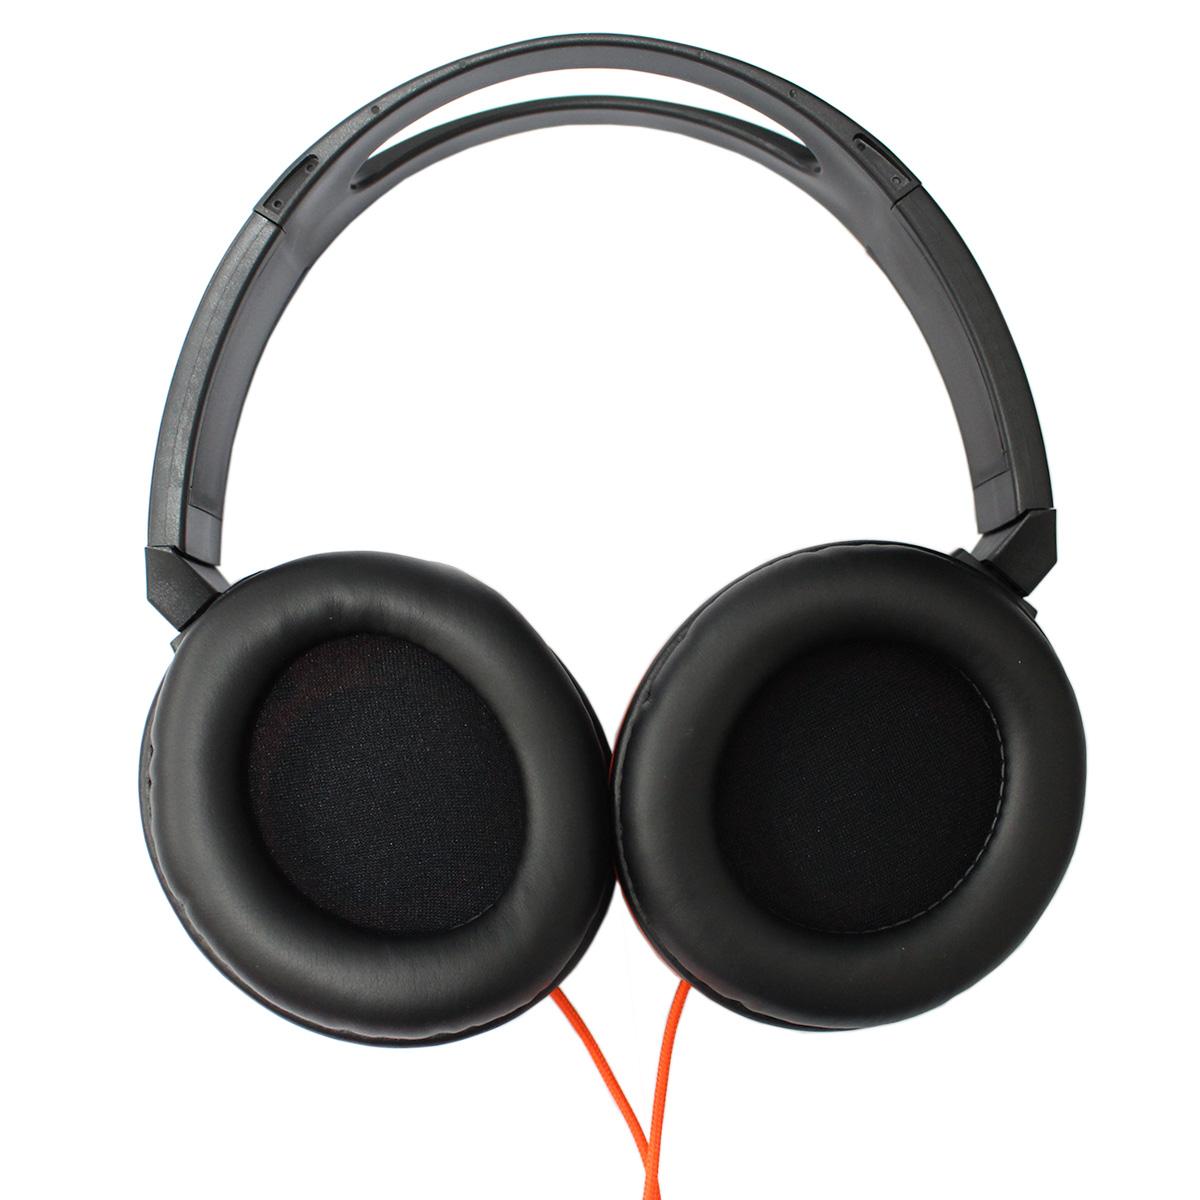 CD680S - Fone de Ouvido Over-ear CD 680 S Laranja - Yoga